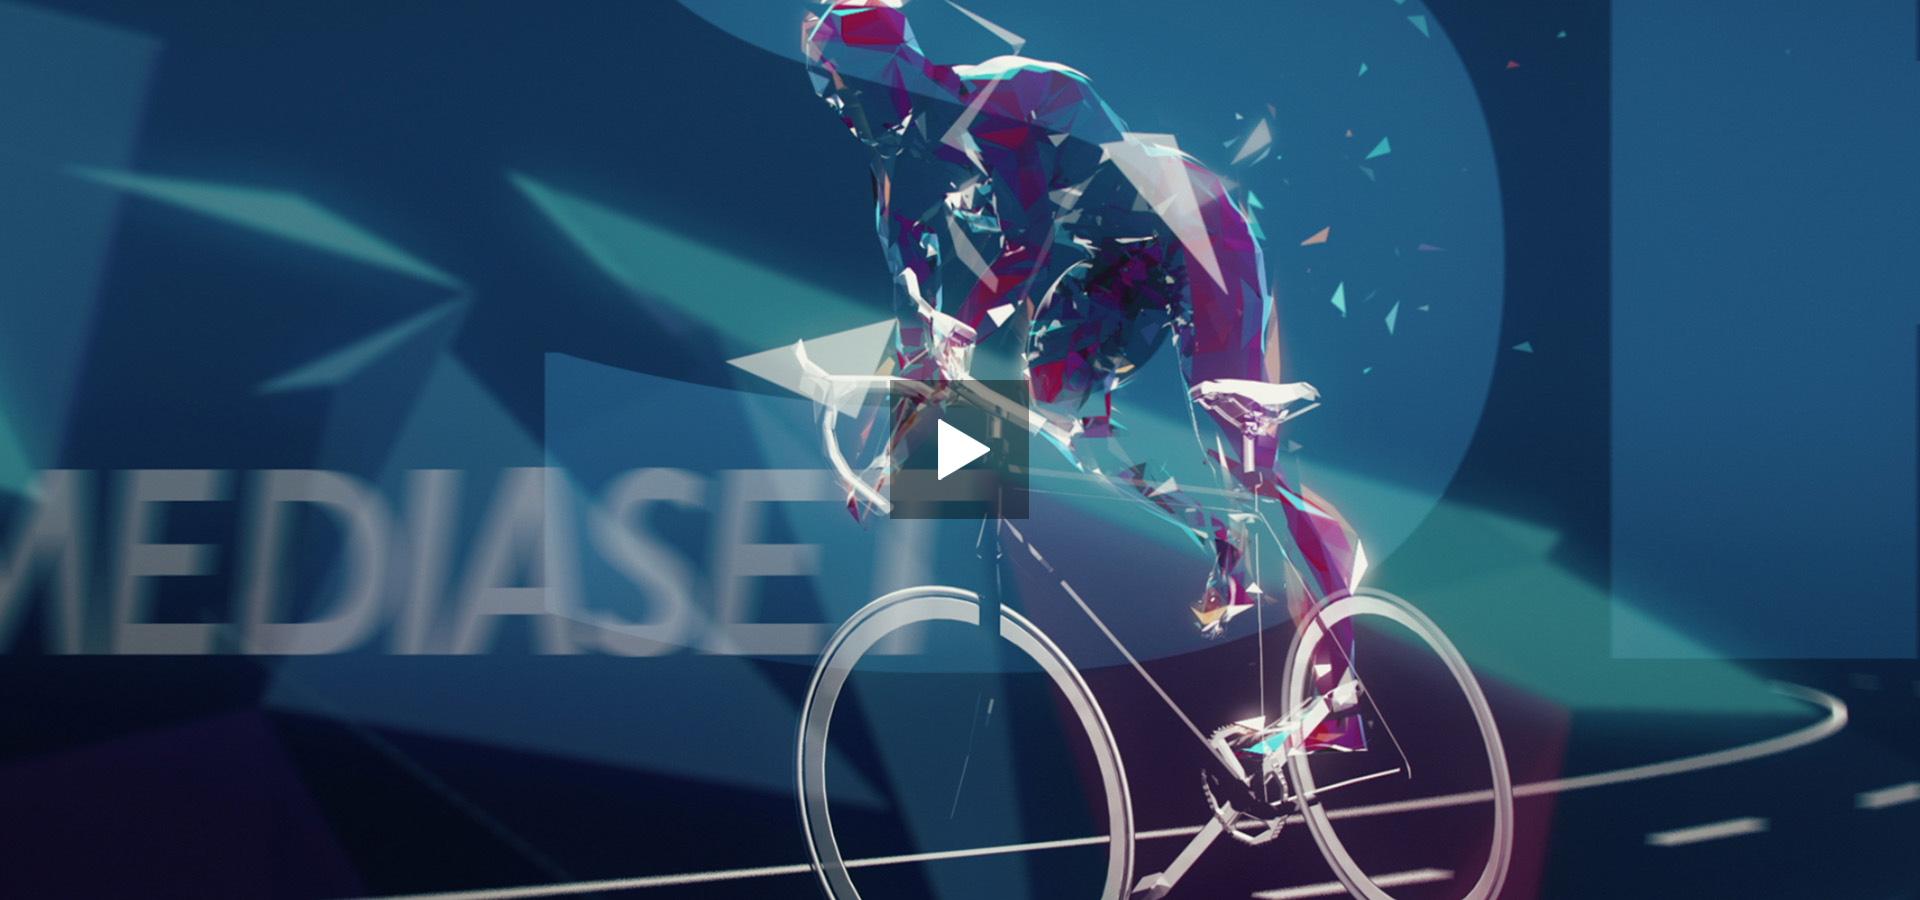 Monkey Talkie per Mediaset Premium Sport - Broadcast design - TV Branding - Promo - Idents